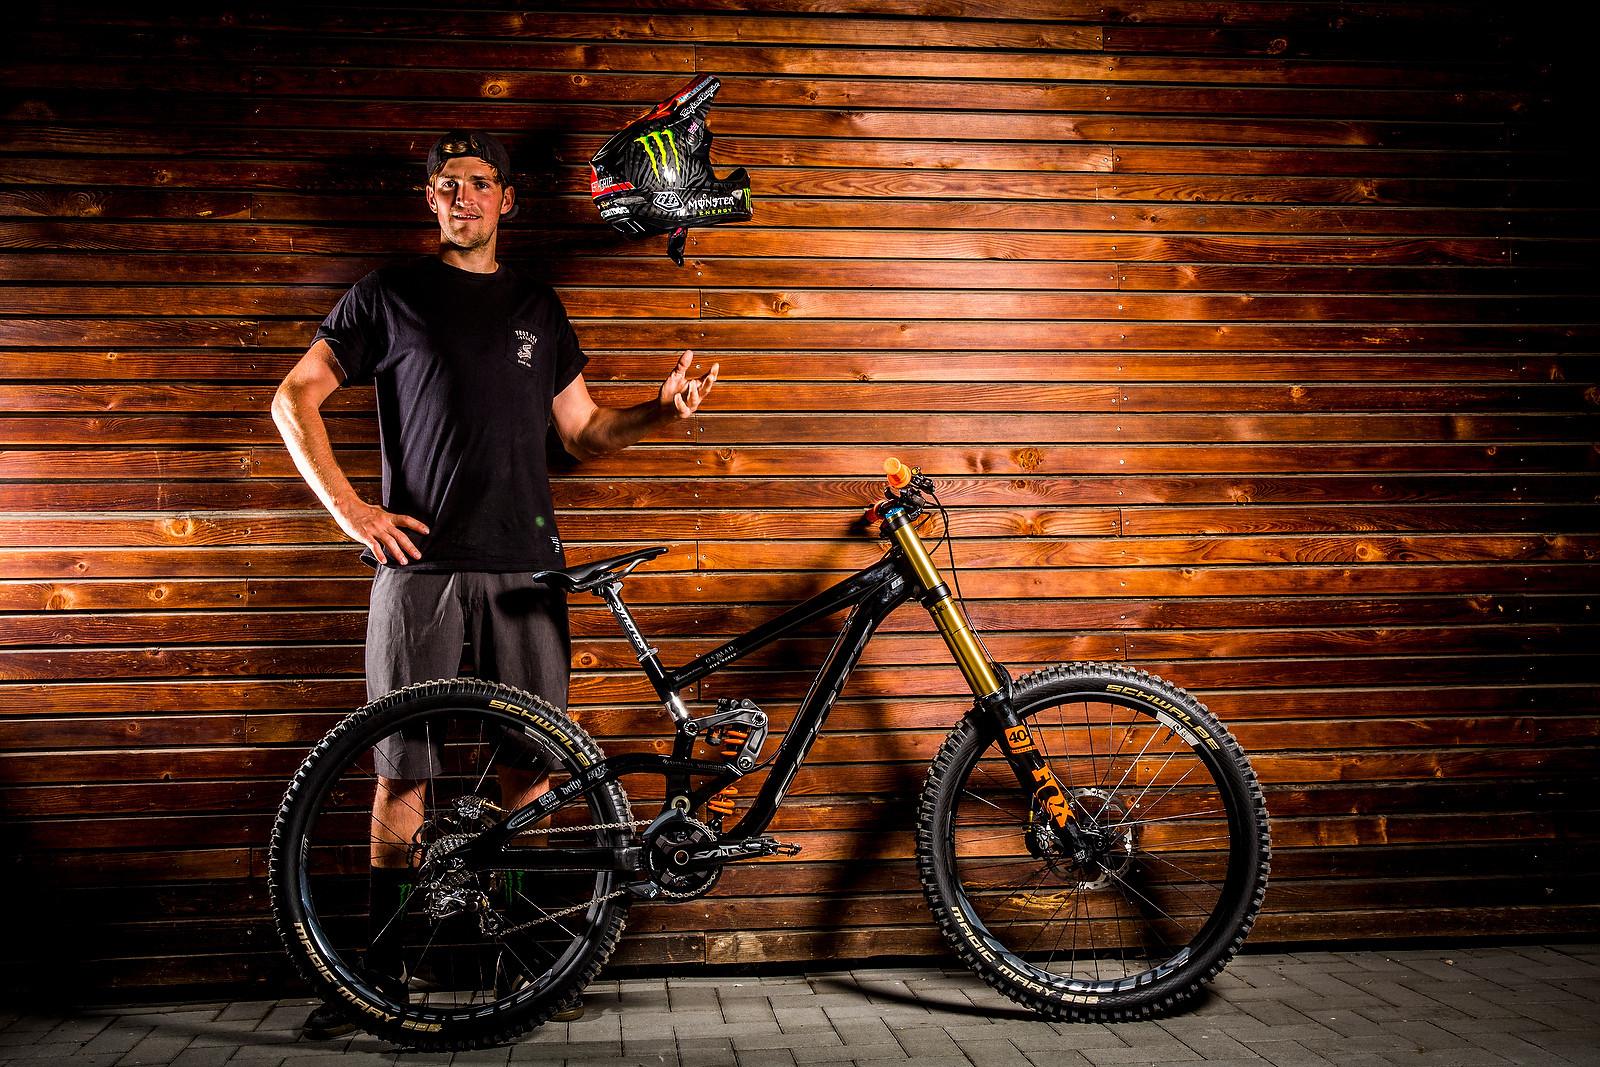 Brendan Fairclough's Scott Gambler | 2016 World Champs Bike - PIT BITS & BIKES - 2016 World Champs - Mountain Biking Pictures - Vital MTB